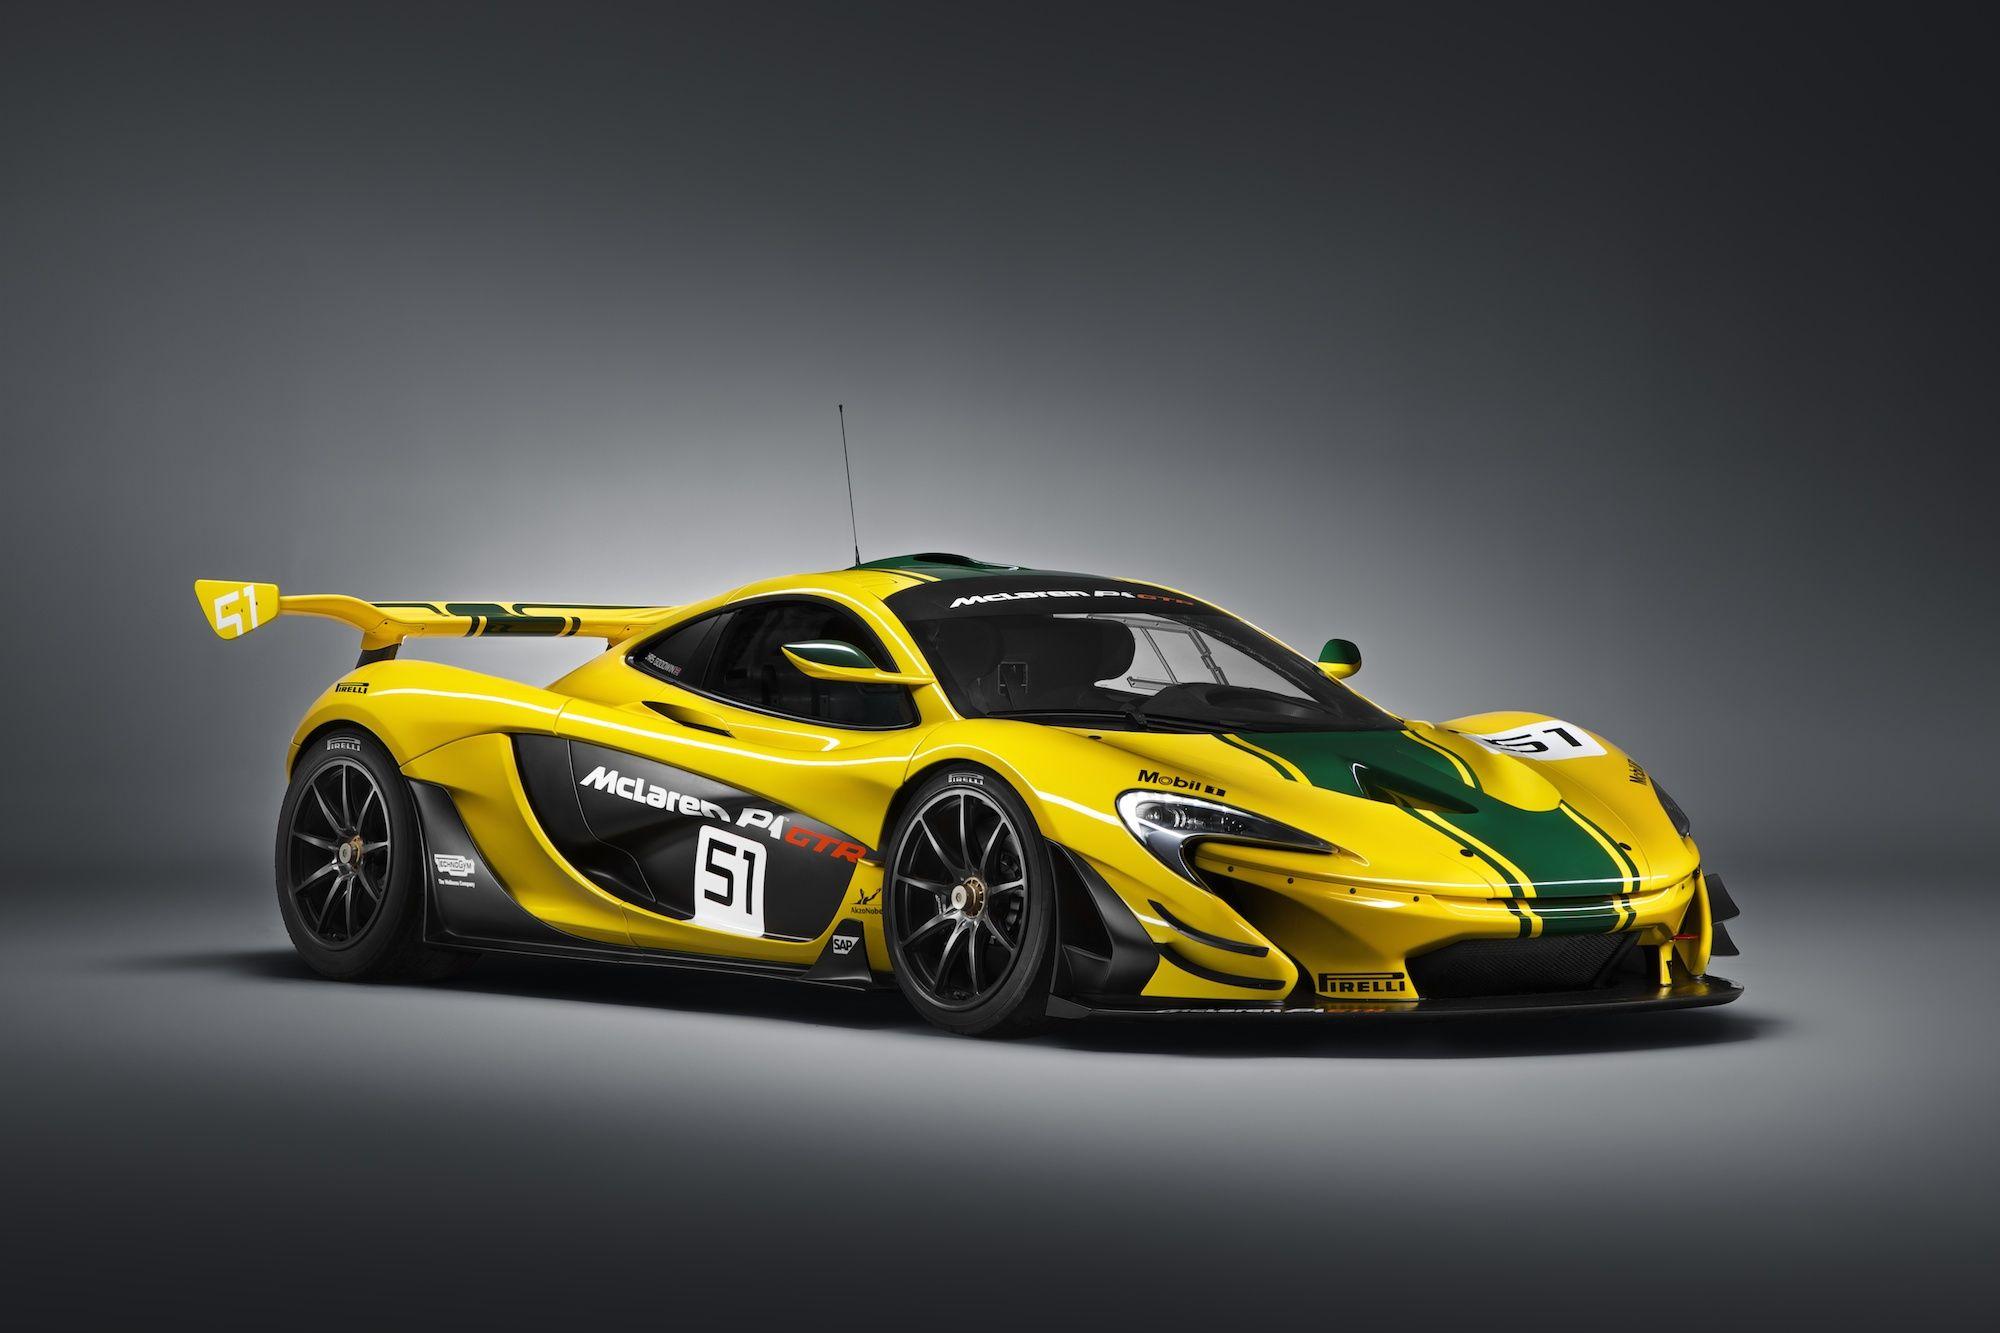 Mclaren p1 gtr extreme track weapon unveiled pictures - The Track Dedicated Mclaren P1 Gtr Based On The Mclaren P1 Road Car